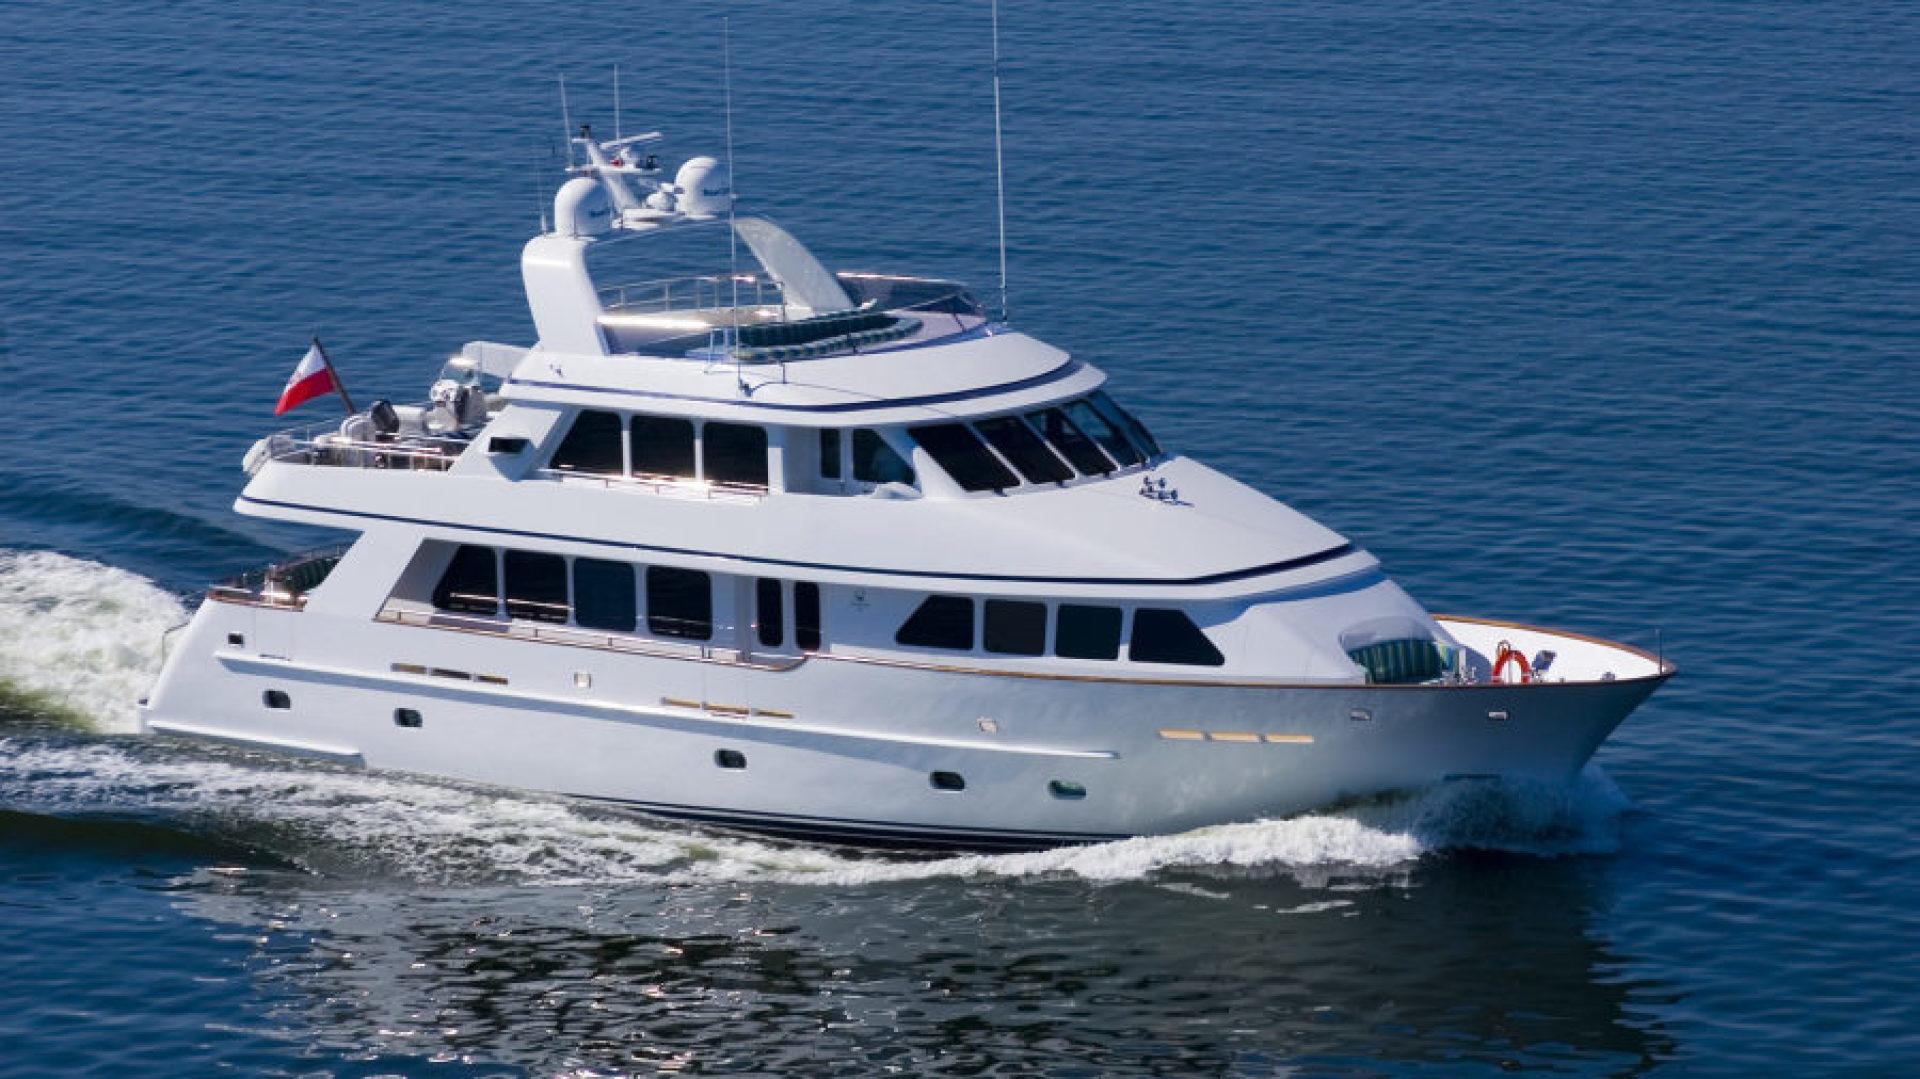 Conrad Shipyard-88 Motor Yacht 2005-Chillin Fort Lauderdale-Florida-United States-Conrad Motor Yacht 2005 Chillin-1537332 | Thumbnail